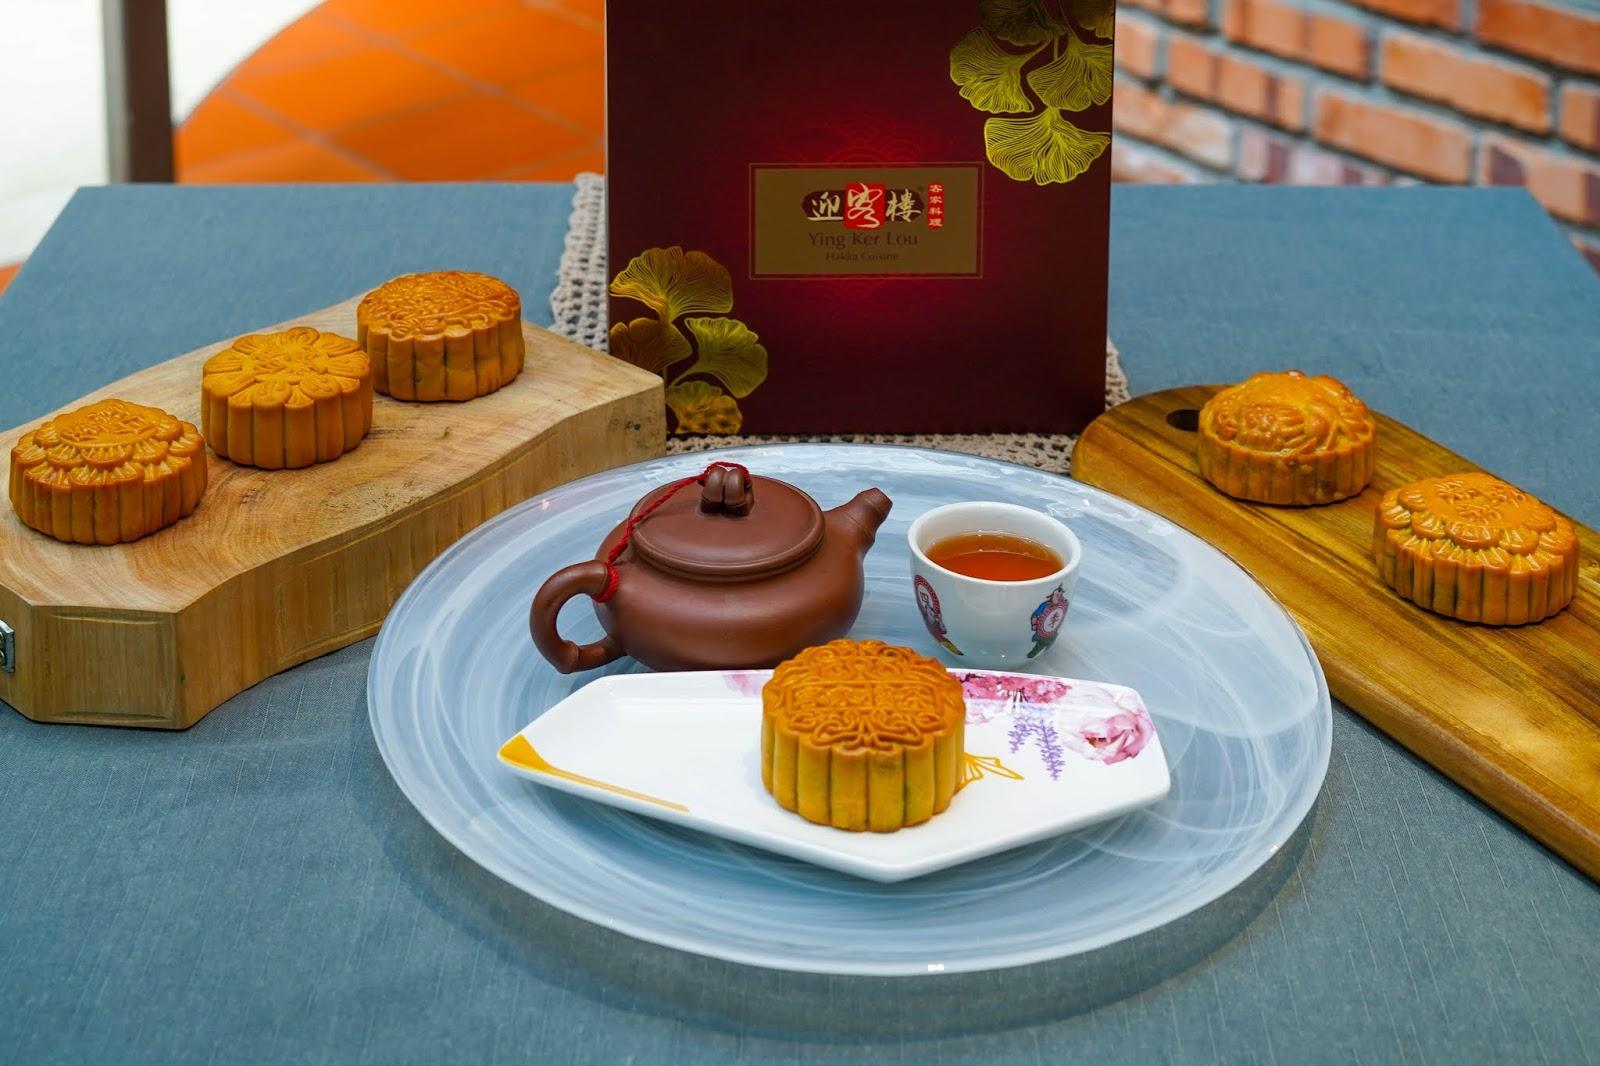 Ying Ker Lou: 2020 Mooncakes